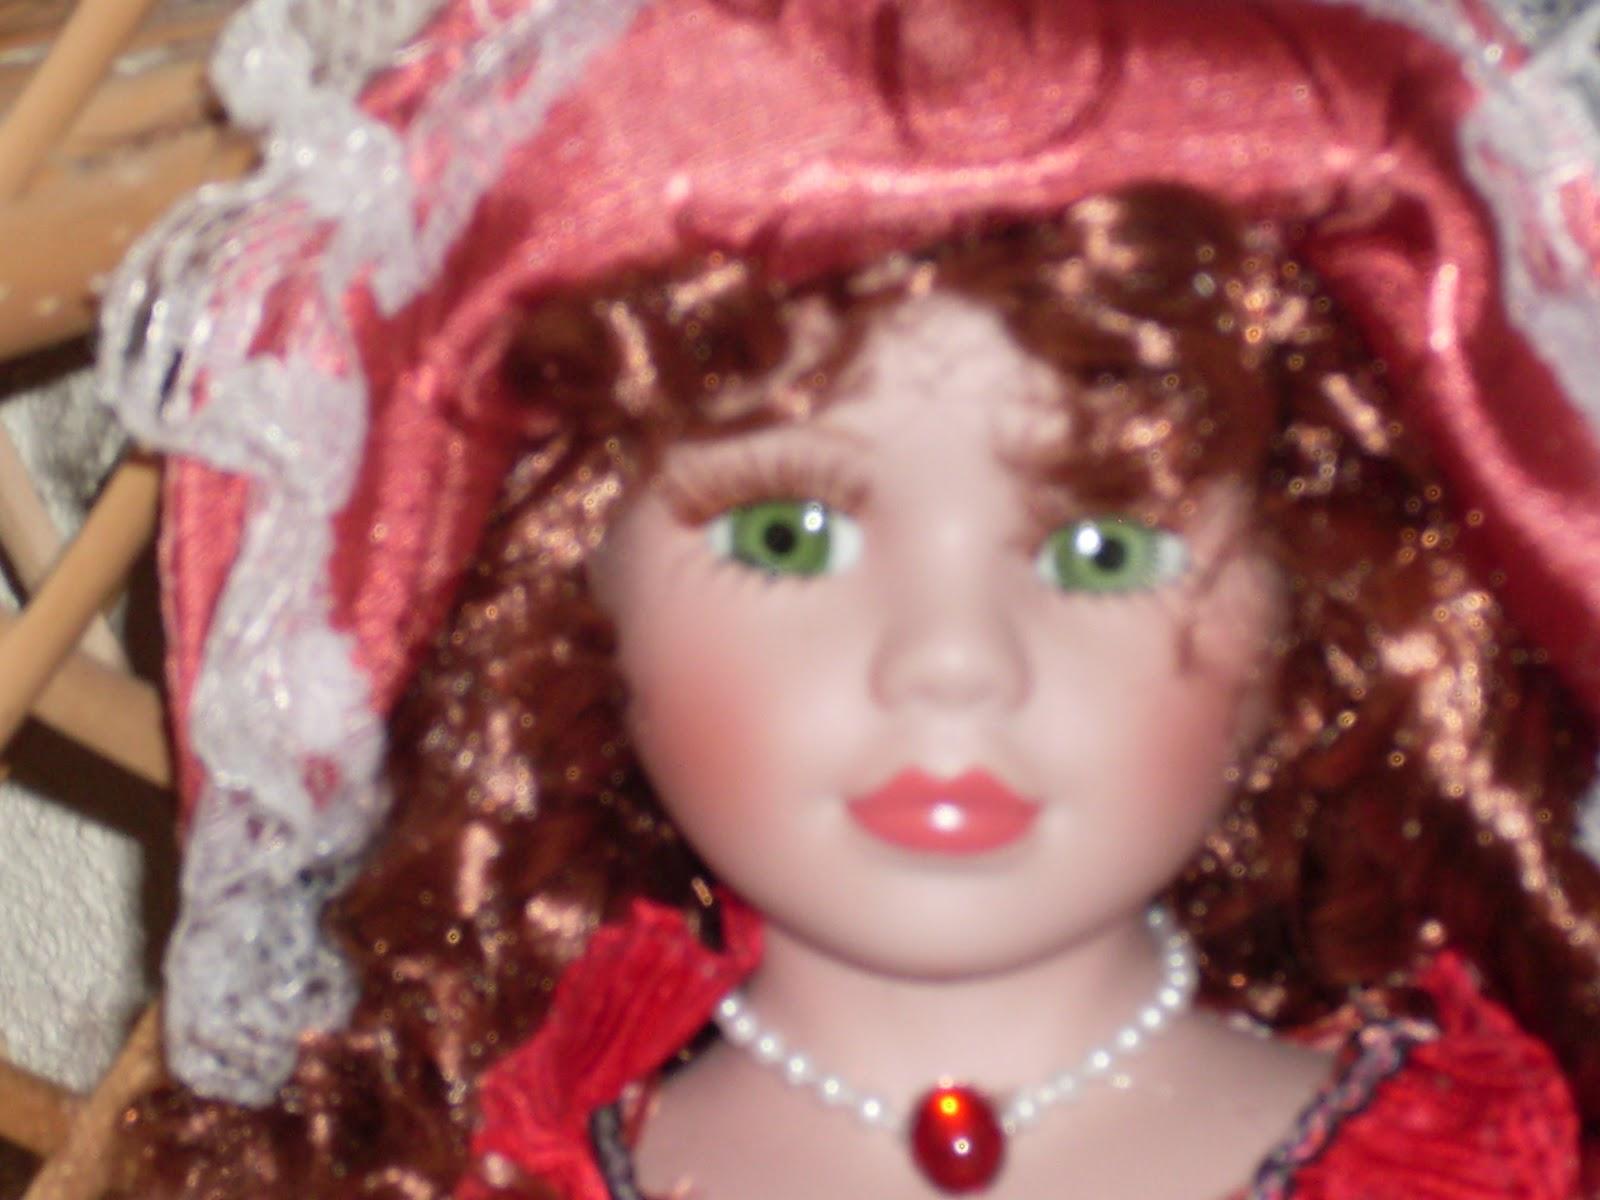 Pupaprinzessin: Muñeca de porcelana vestida de traje de época rojo ♥